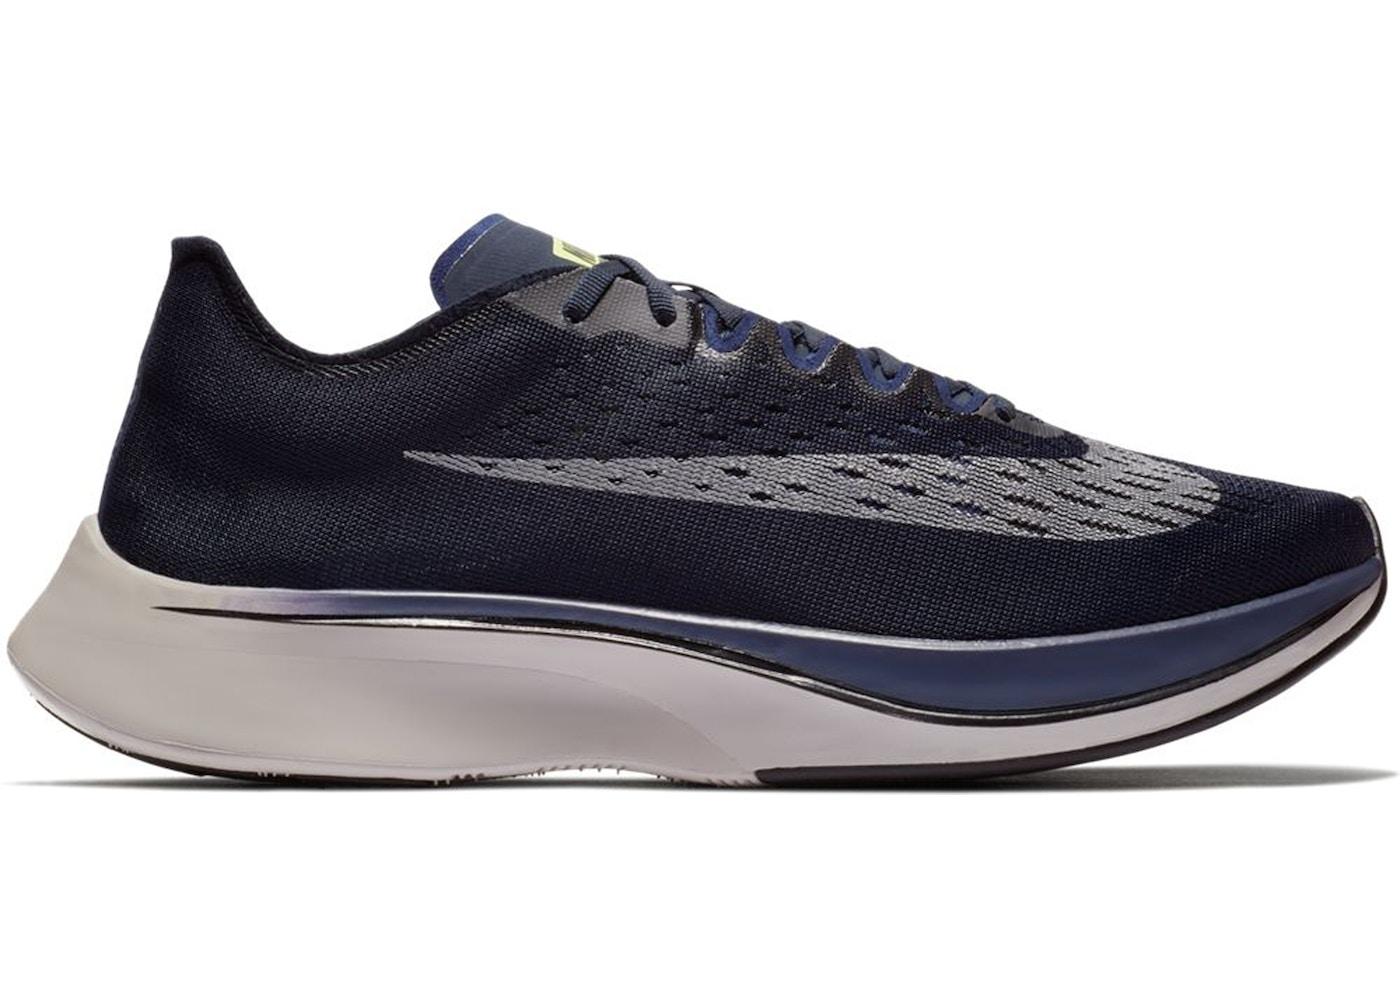 NEW Nike Zoom Vaporfly 4% Obsidian Size 9.5